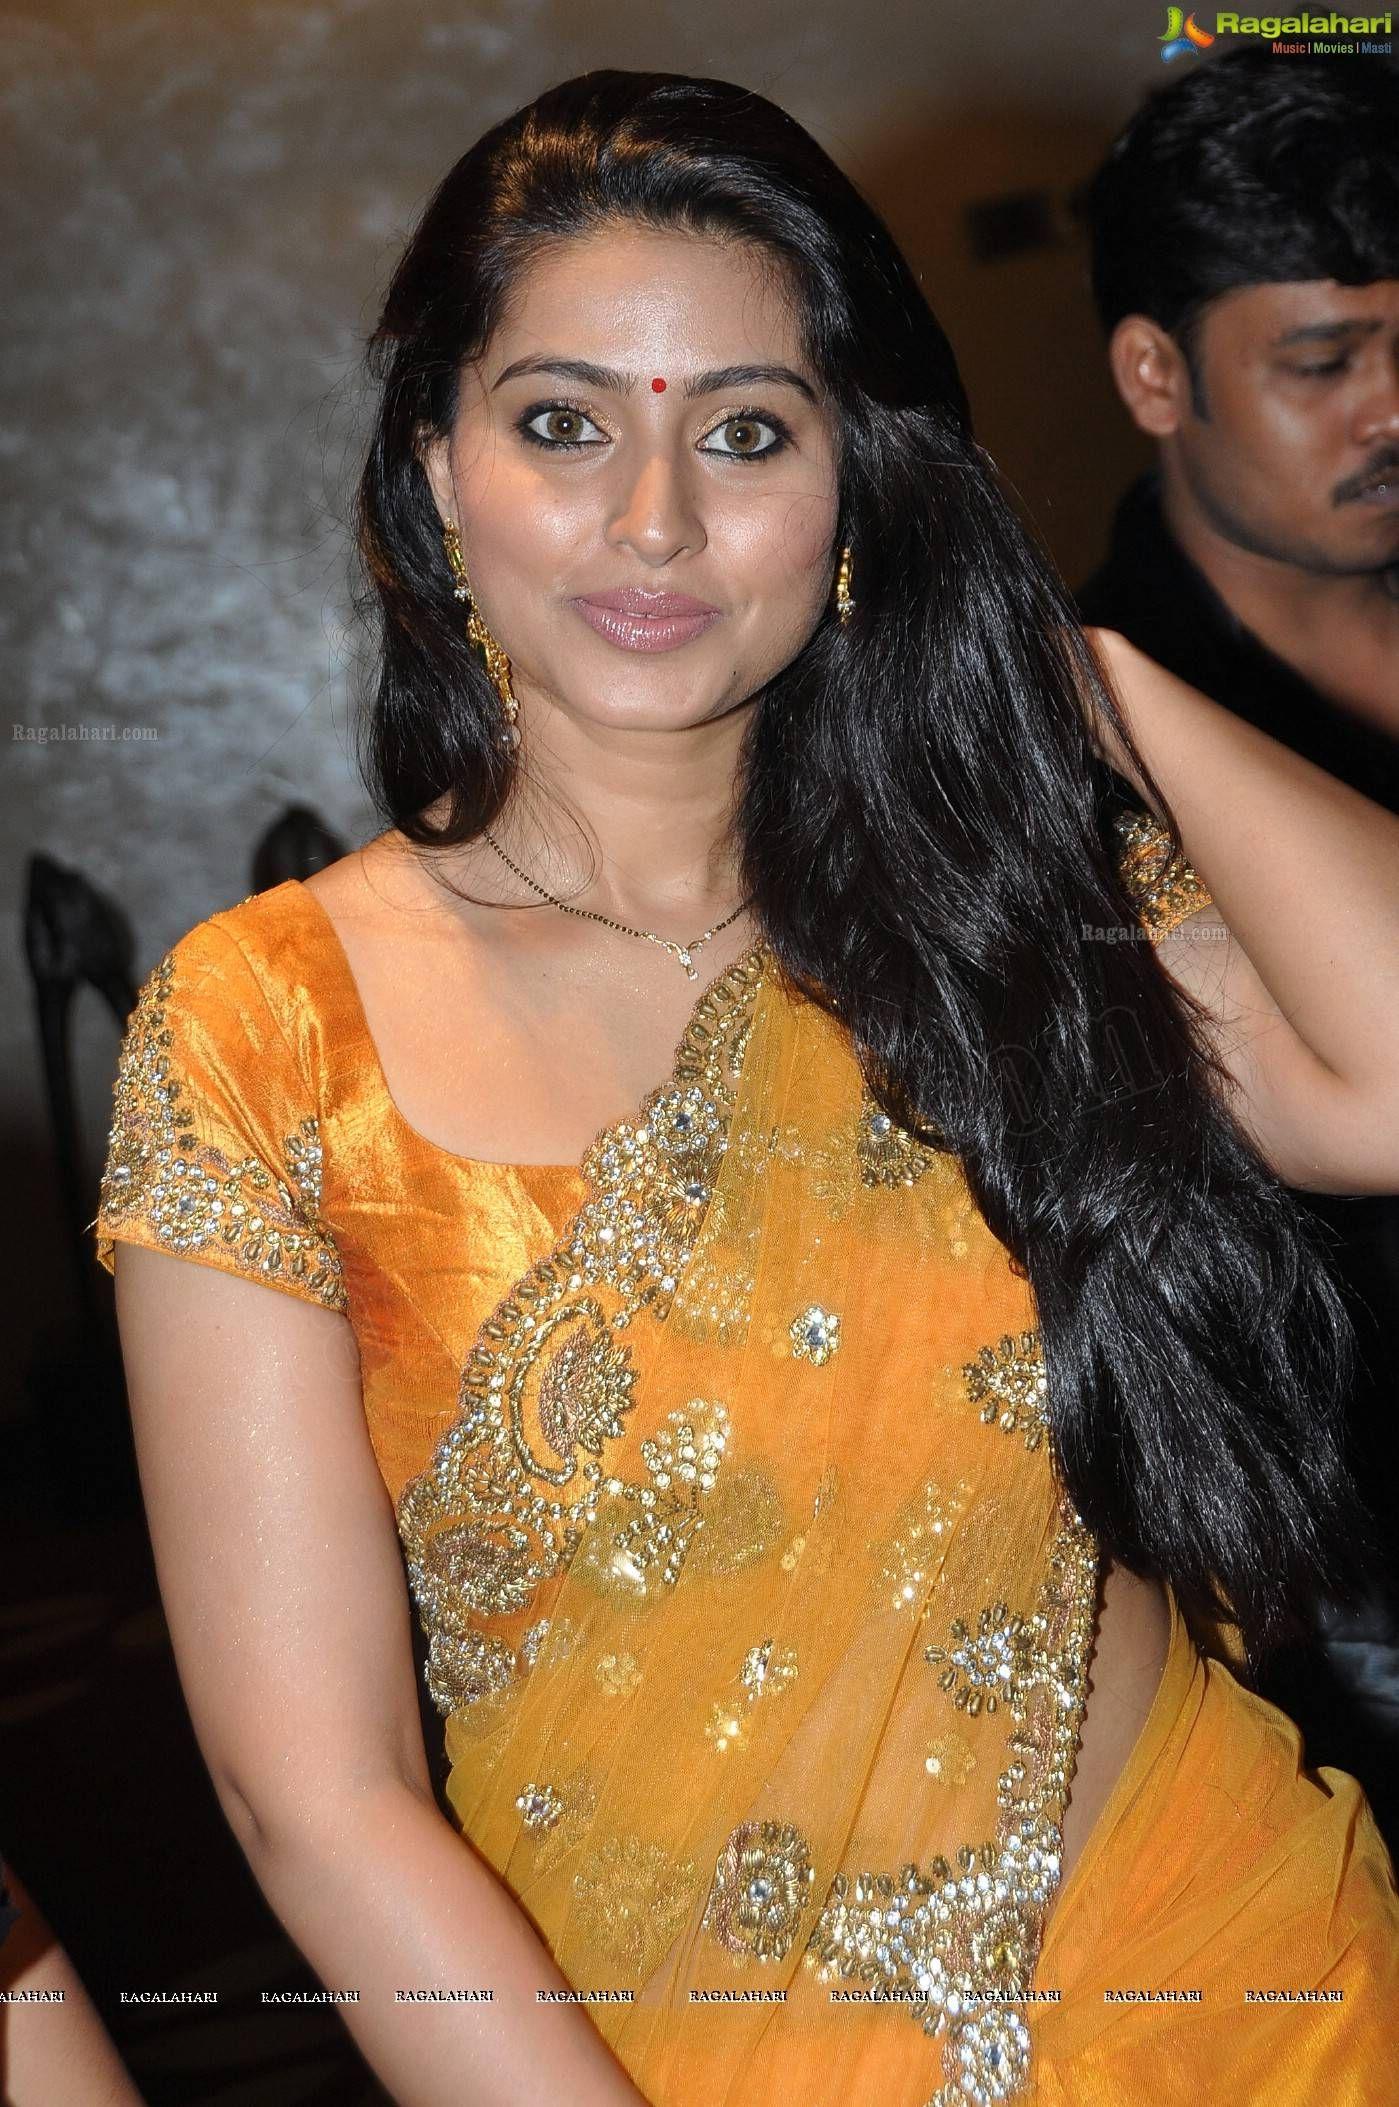 Sneha Hot In Saree Latest Hot Pics